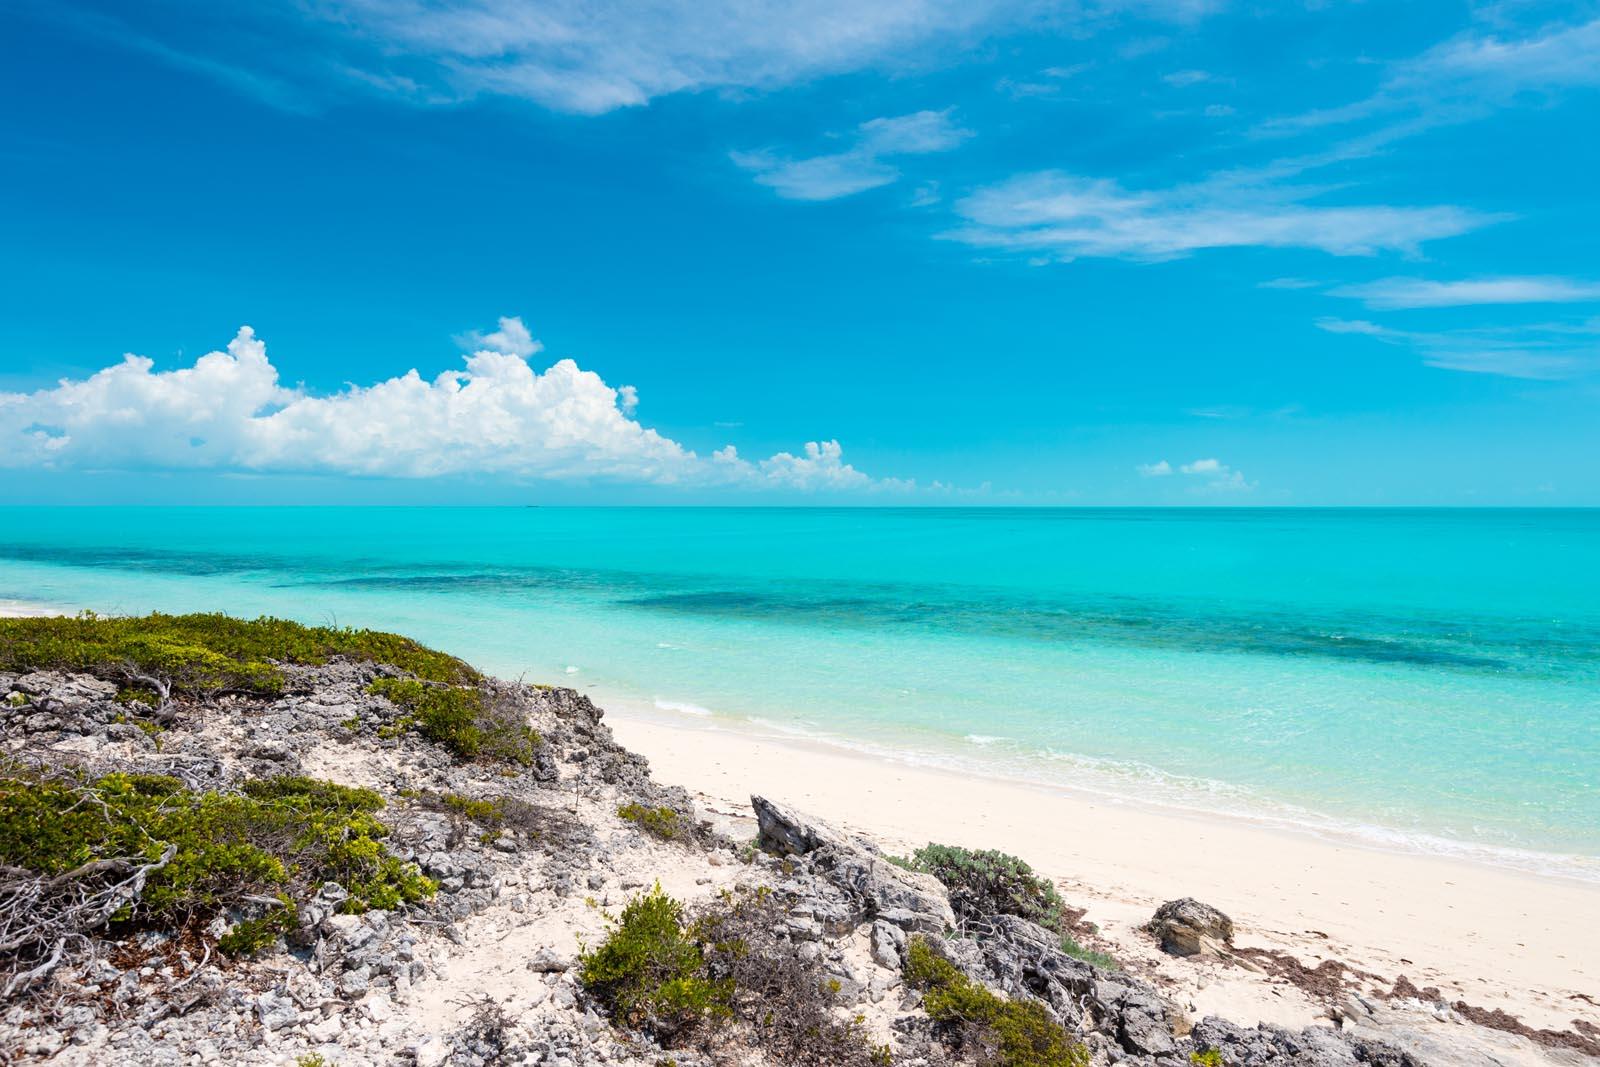 Direct Tv Cable And Internet >> Villa Isla, Long Bay Beach, Providenciales (Provo) / Turks and Caicos Islands – Caribbean Villa ...